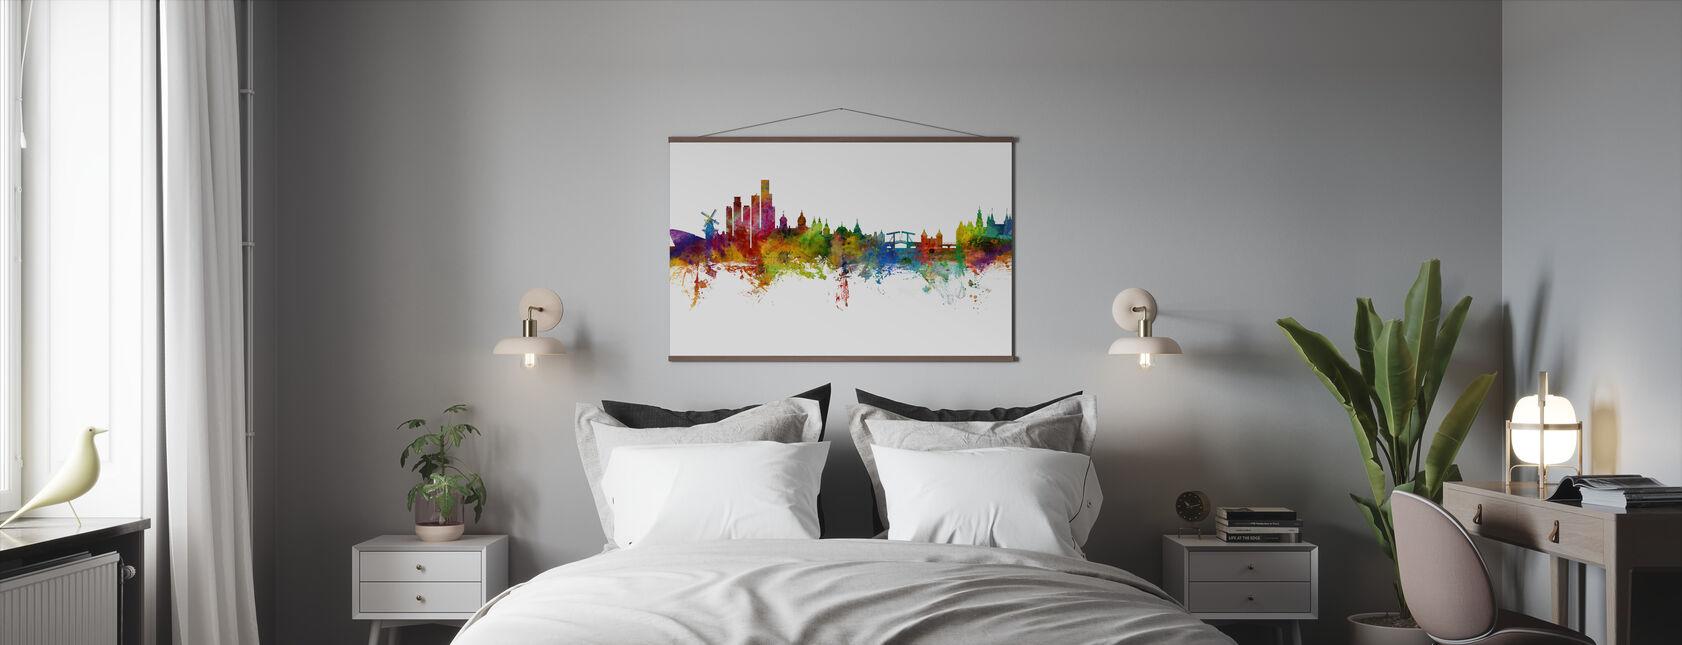 Amsterdamse Skyline windmolen - Poster - Slaapkamer